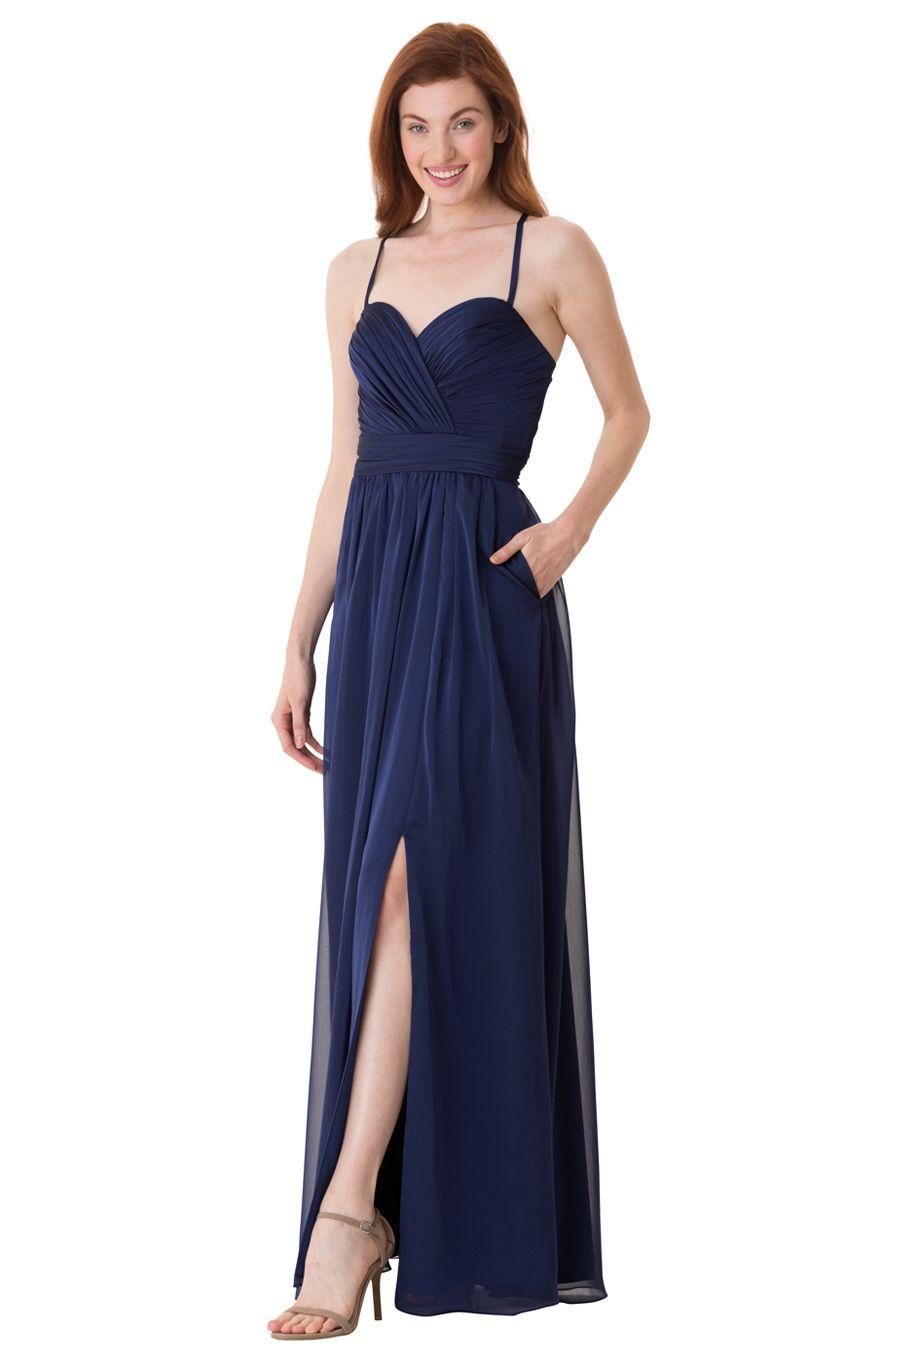 Bari jay bridesmaids bridesmaid dresses prom dresses u formal